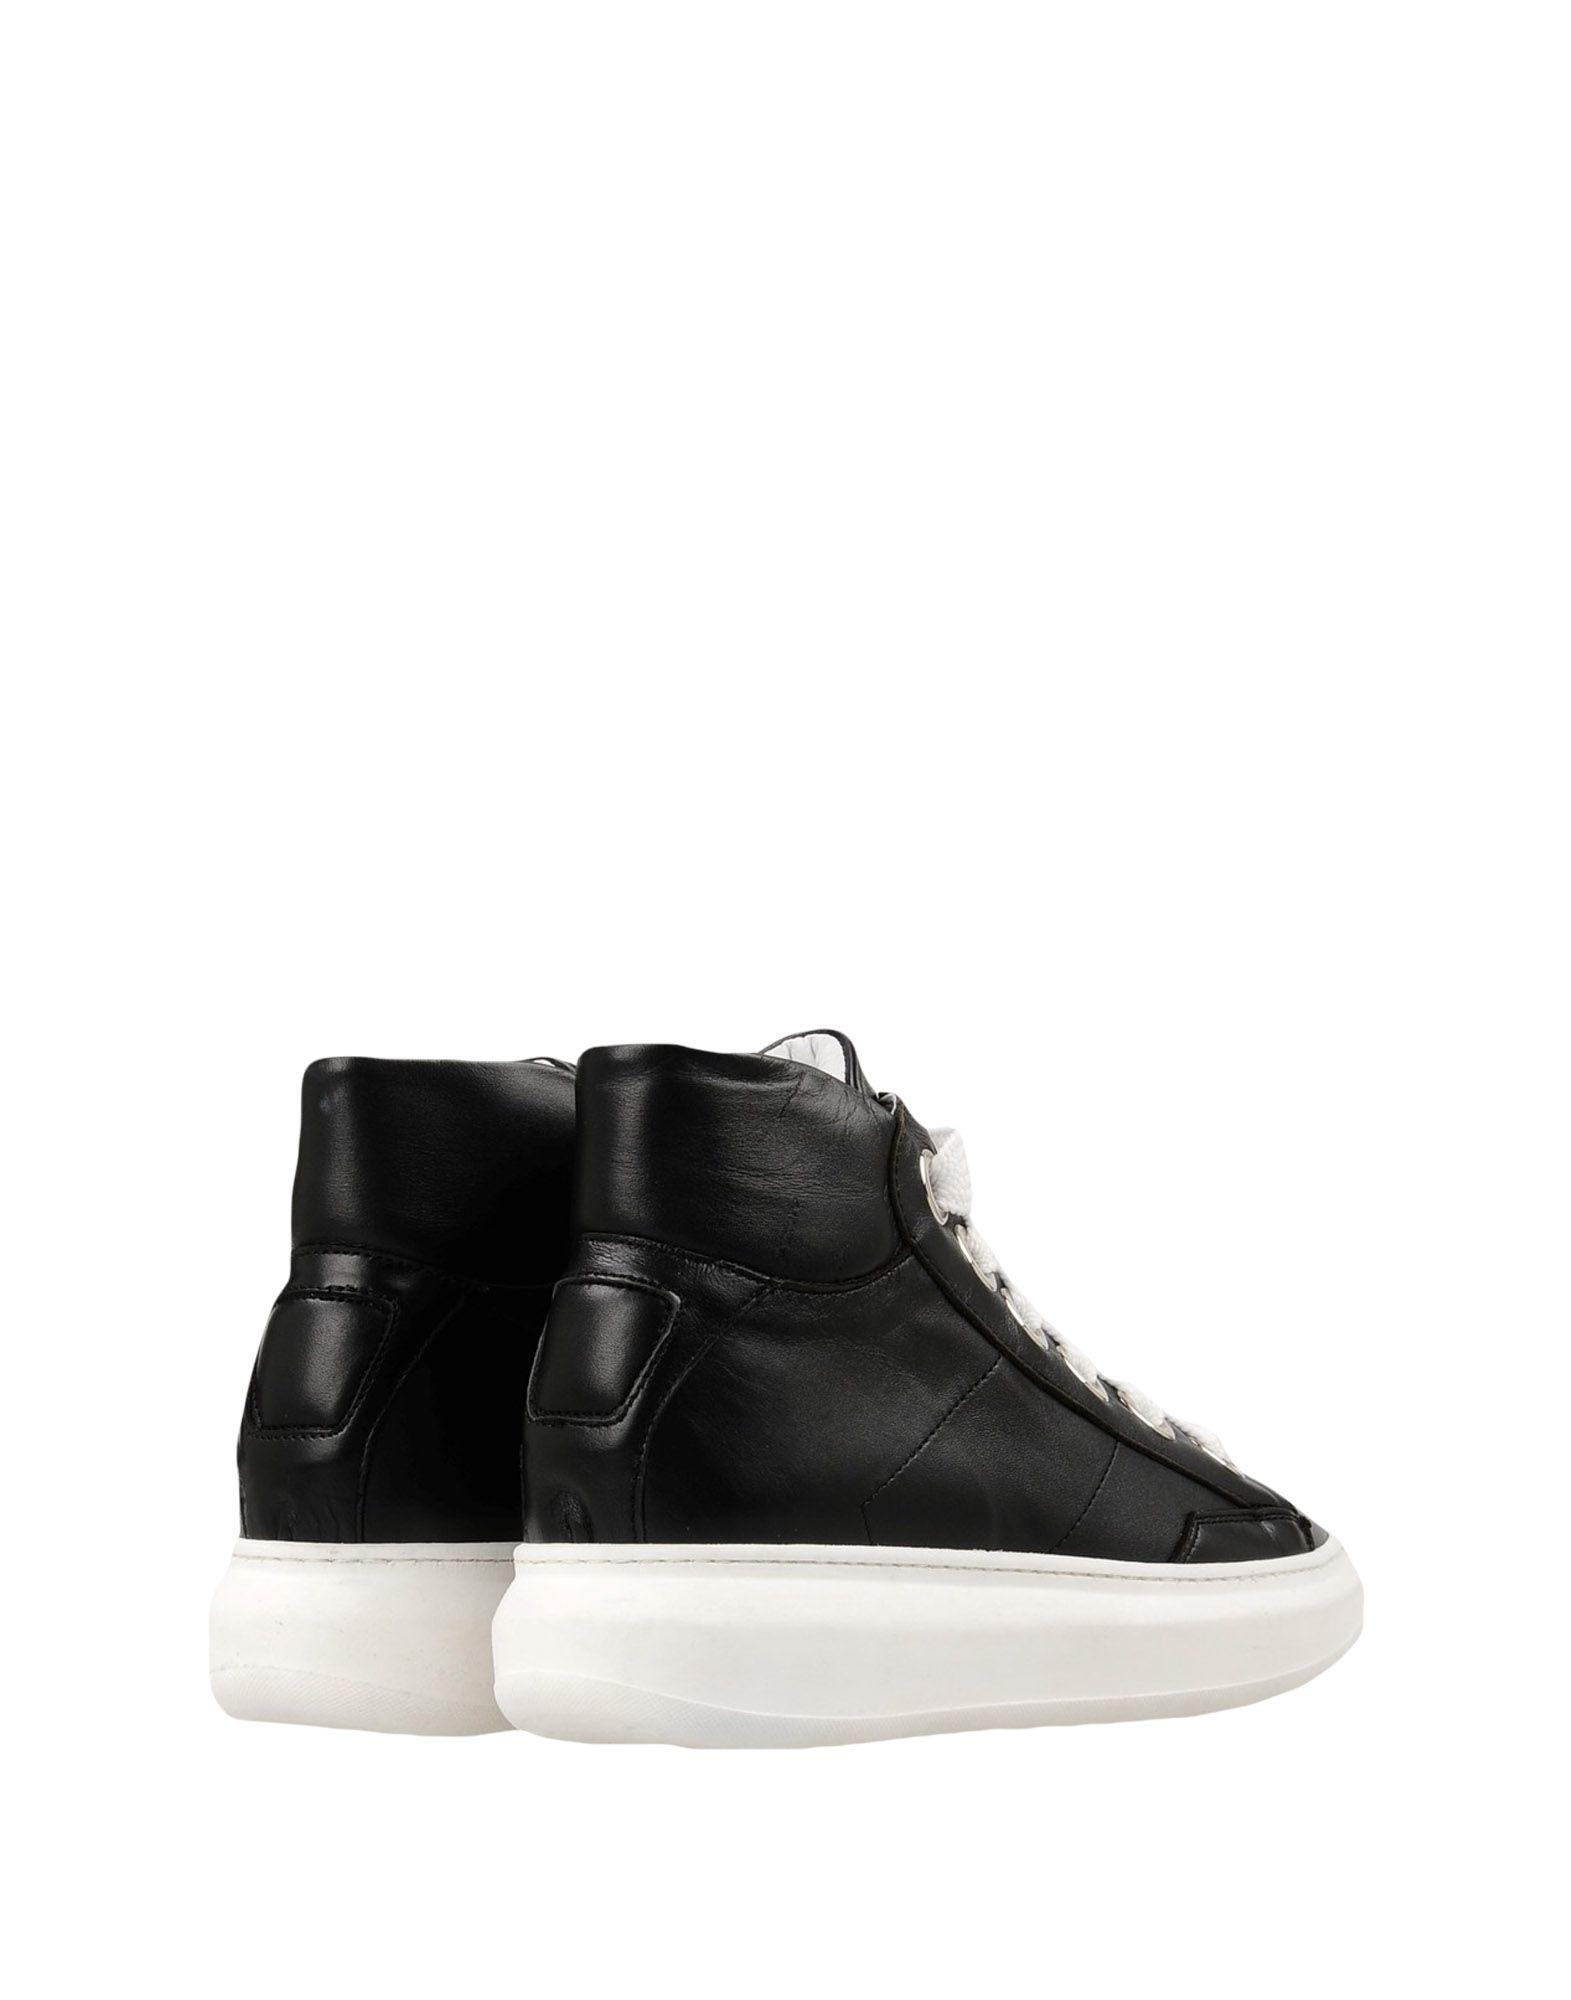 Pierre Darré Gute Sneakers Damen  11434920DL Gute Darré Qualität beliebte Schuhe 1f489e